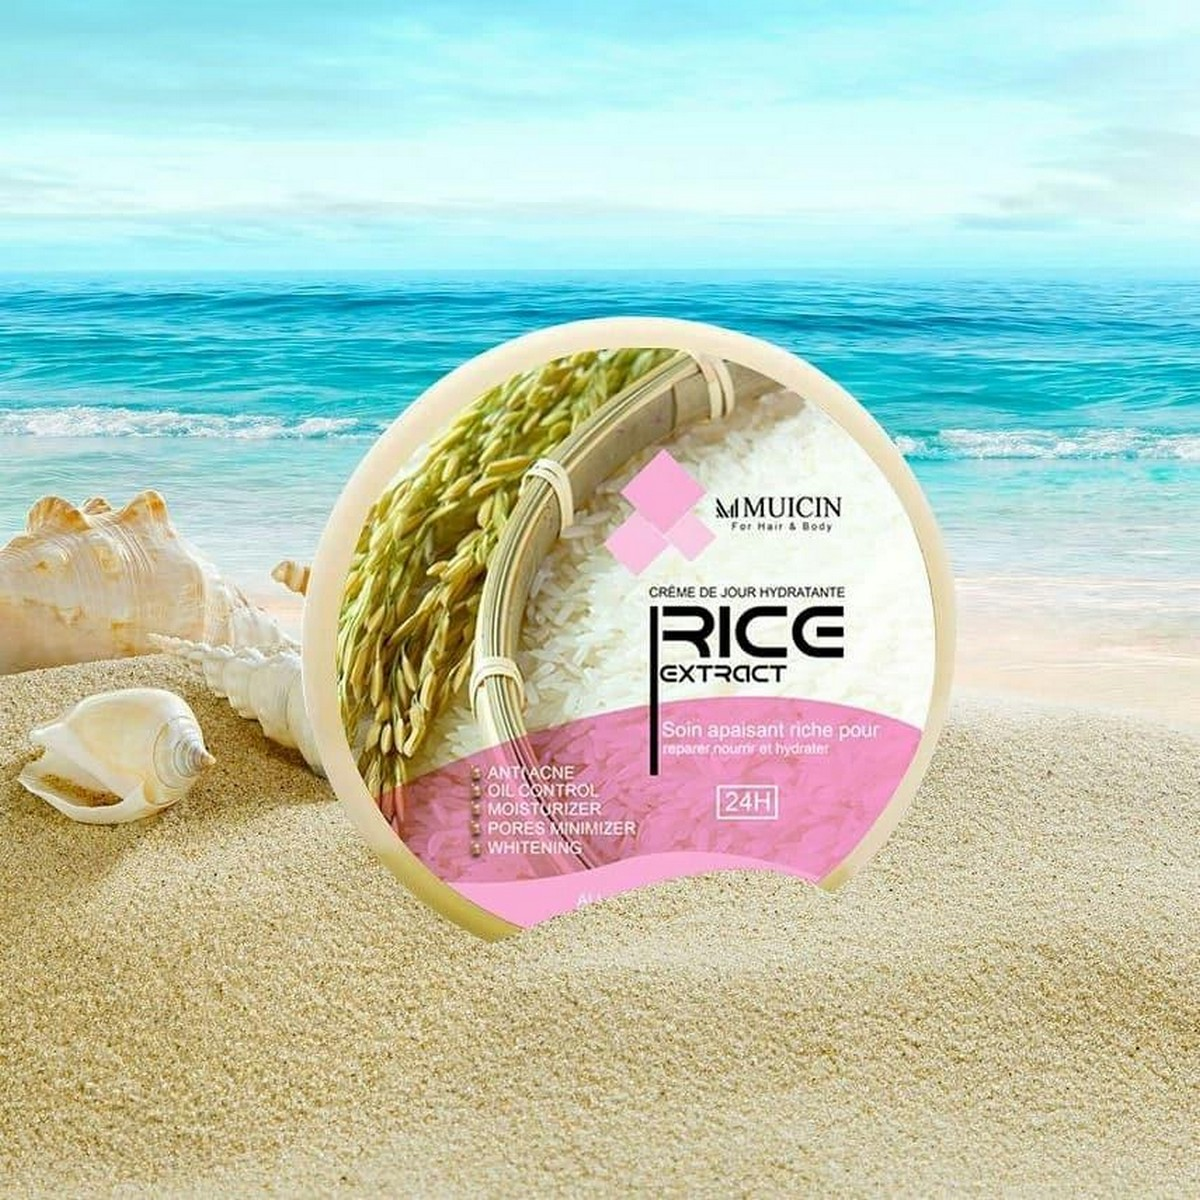 MUICIN RICE EXTRACT SOOTHING GEL FOR HAIR & BODY ANTI ACNE REITALIZING MOISTURIZING ANTI WRINKLES 300G